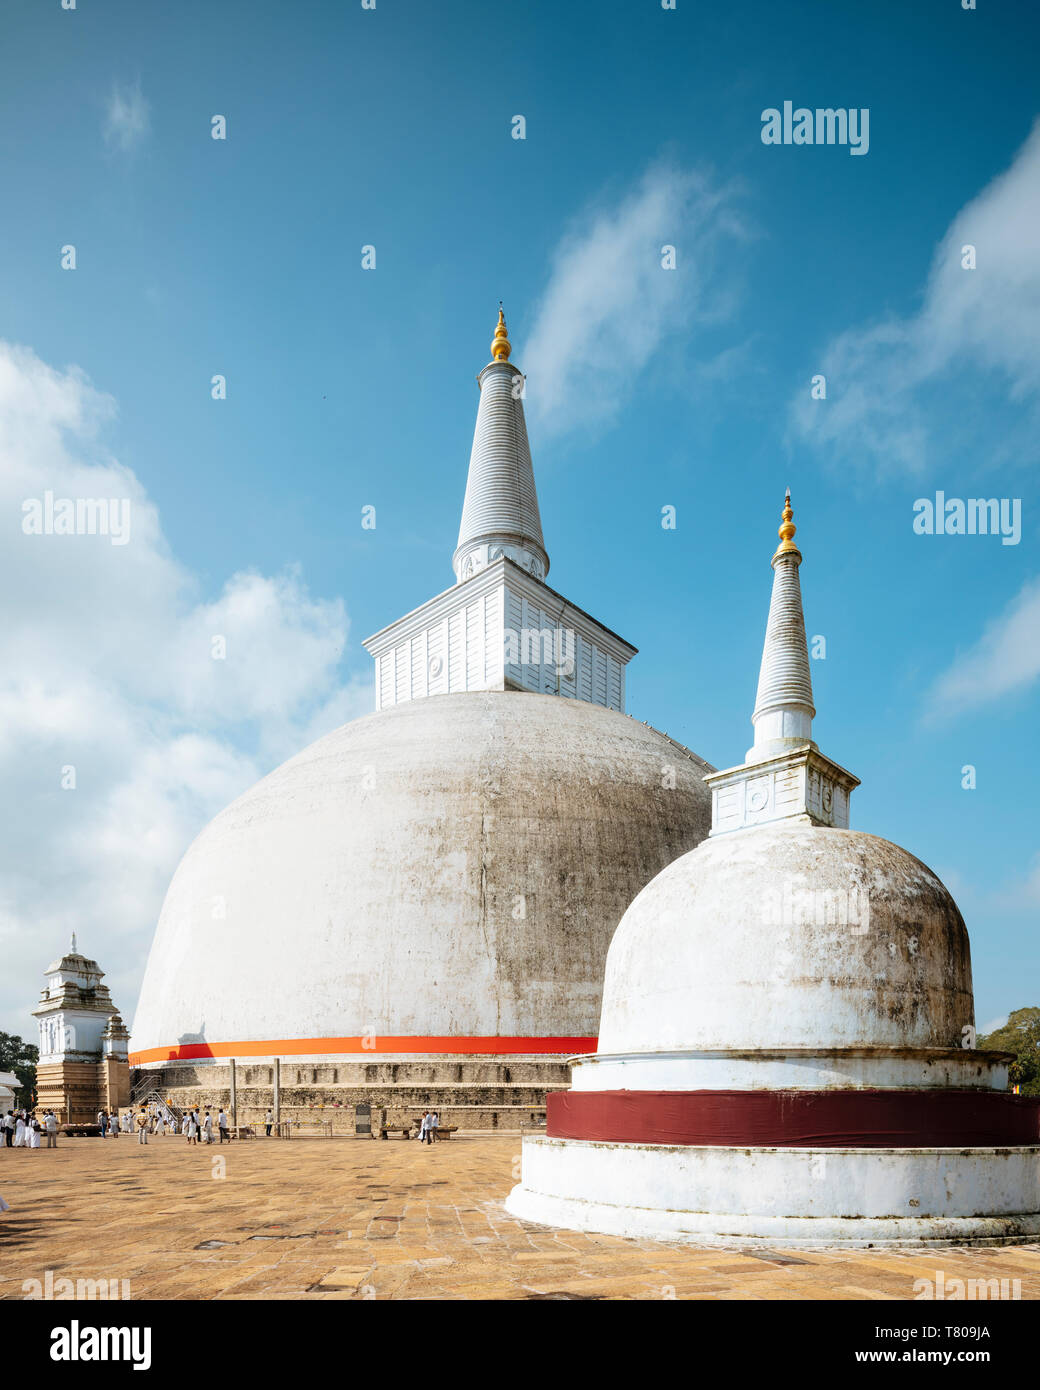 Saya Ruwanweli Dagoba (Stupa de sable doré), Anuradhapura, UNESCO World Heritage Site, North Central Province, Sri Lanka, Asie Banque D'Images